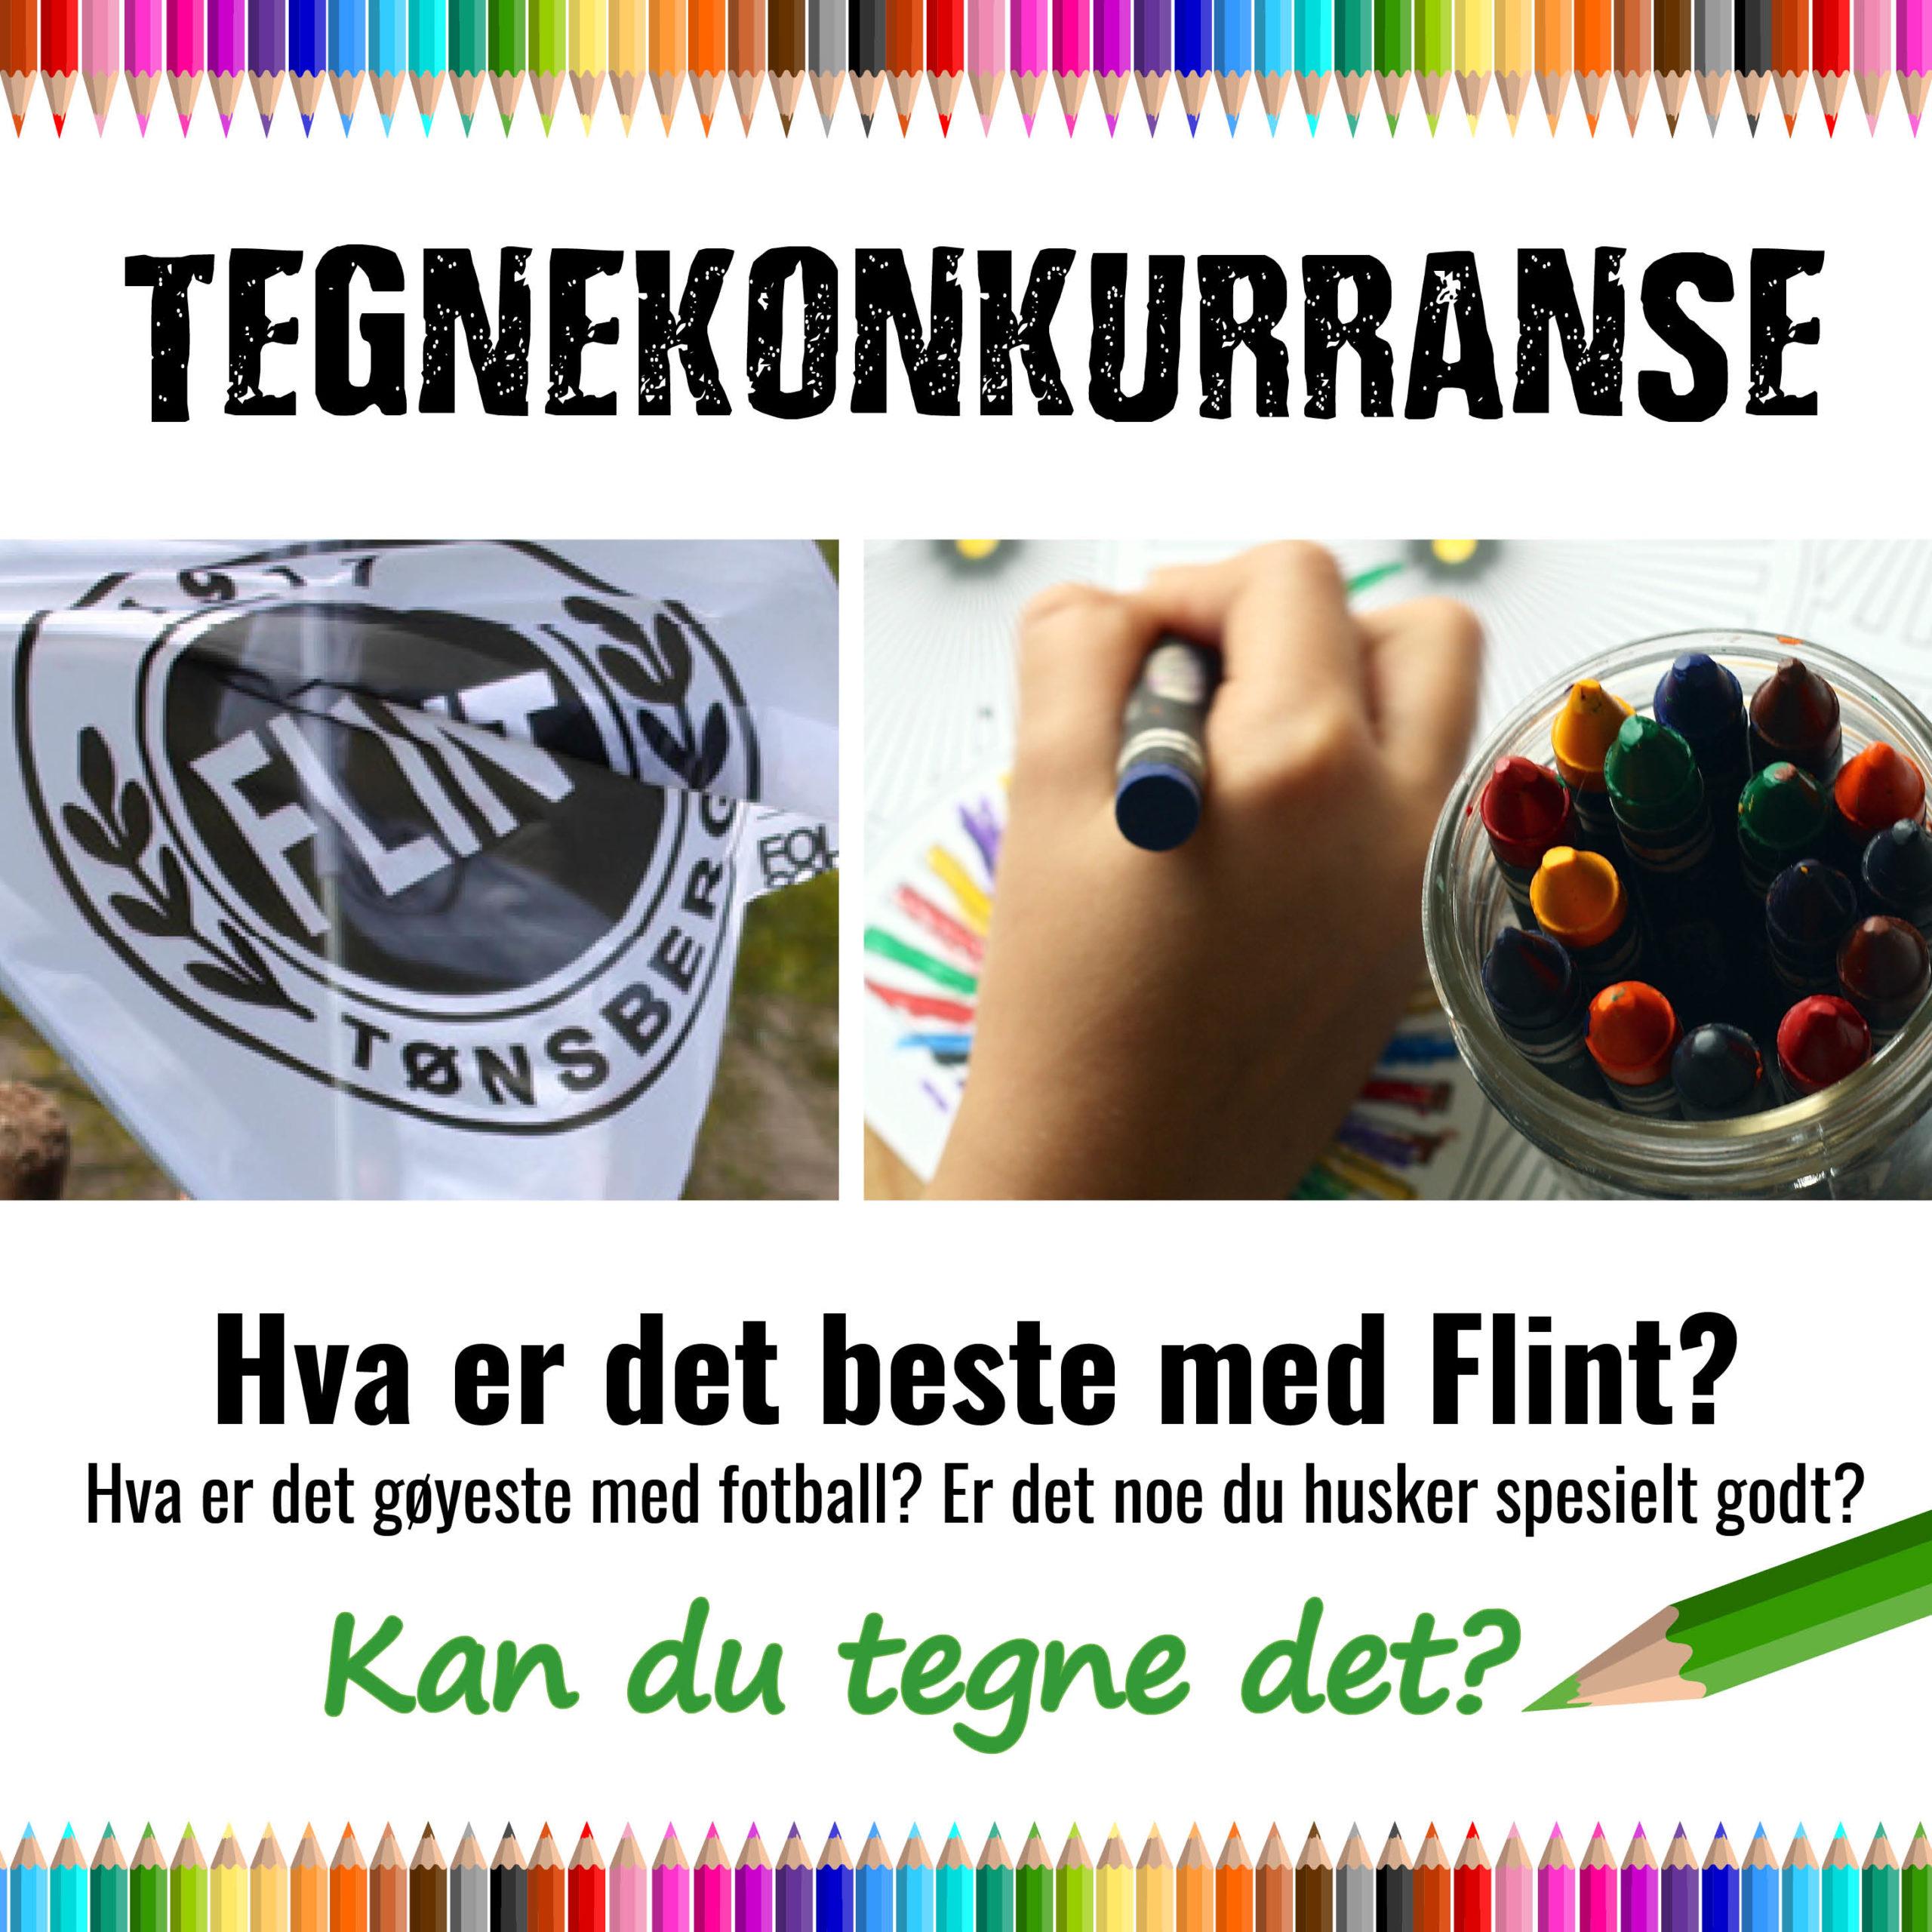 https://www.flintfotball.no/wp-content/uploads/2021/04/Tegnekonkurranse-verdiprosjekt3-scaled.jpg